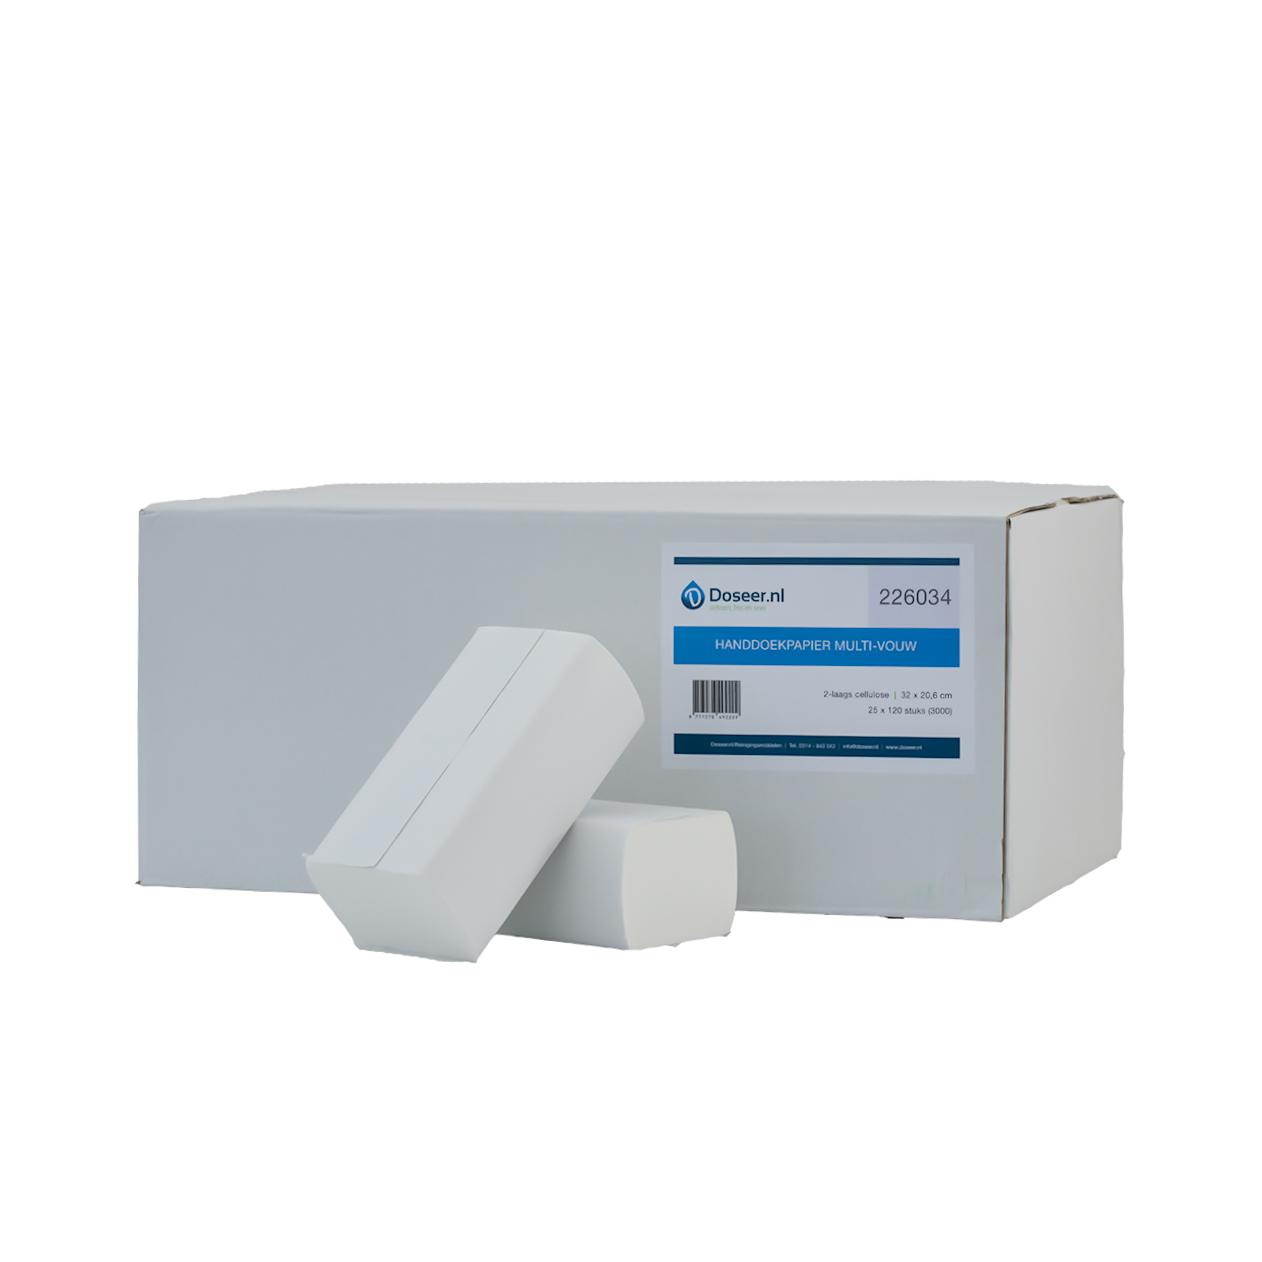 Doseer.nl handdoekpapier Multifold 2-lgs 32 x 20.6 cm, 3000 stuks